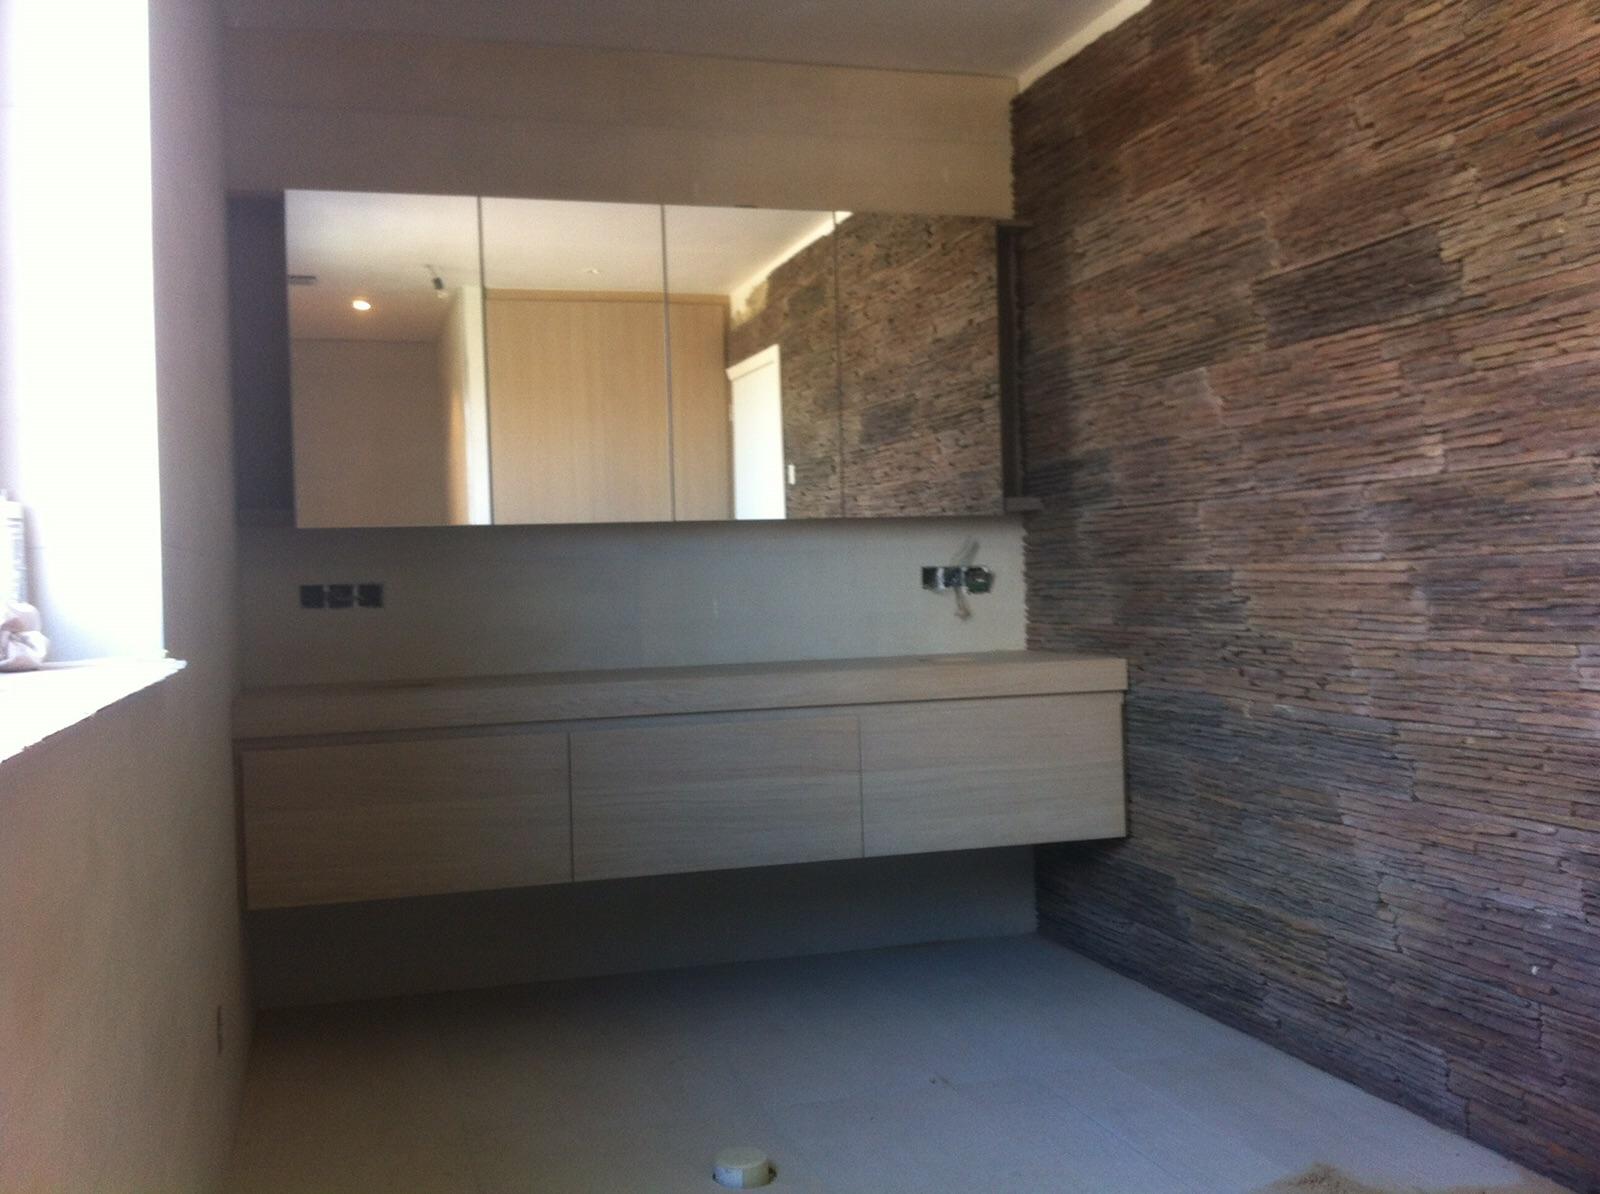 Badkamermeubel design by devos - Meubels originele badkamer ...